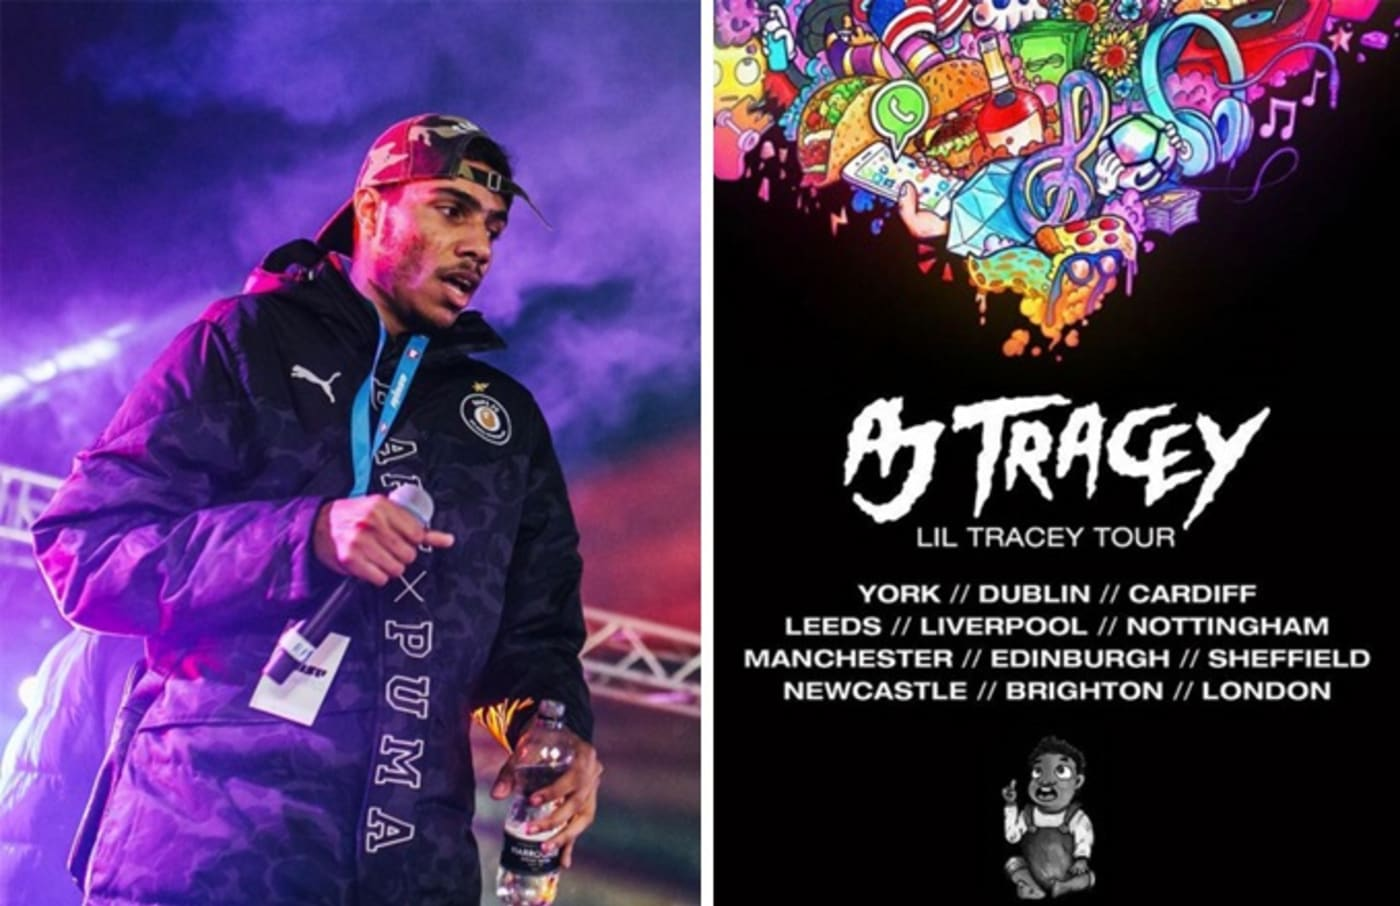 aj tracey uk tour